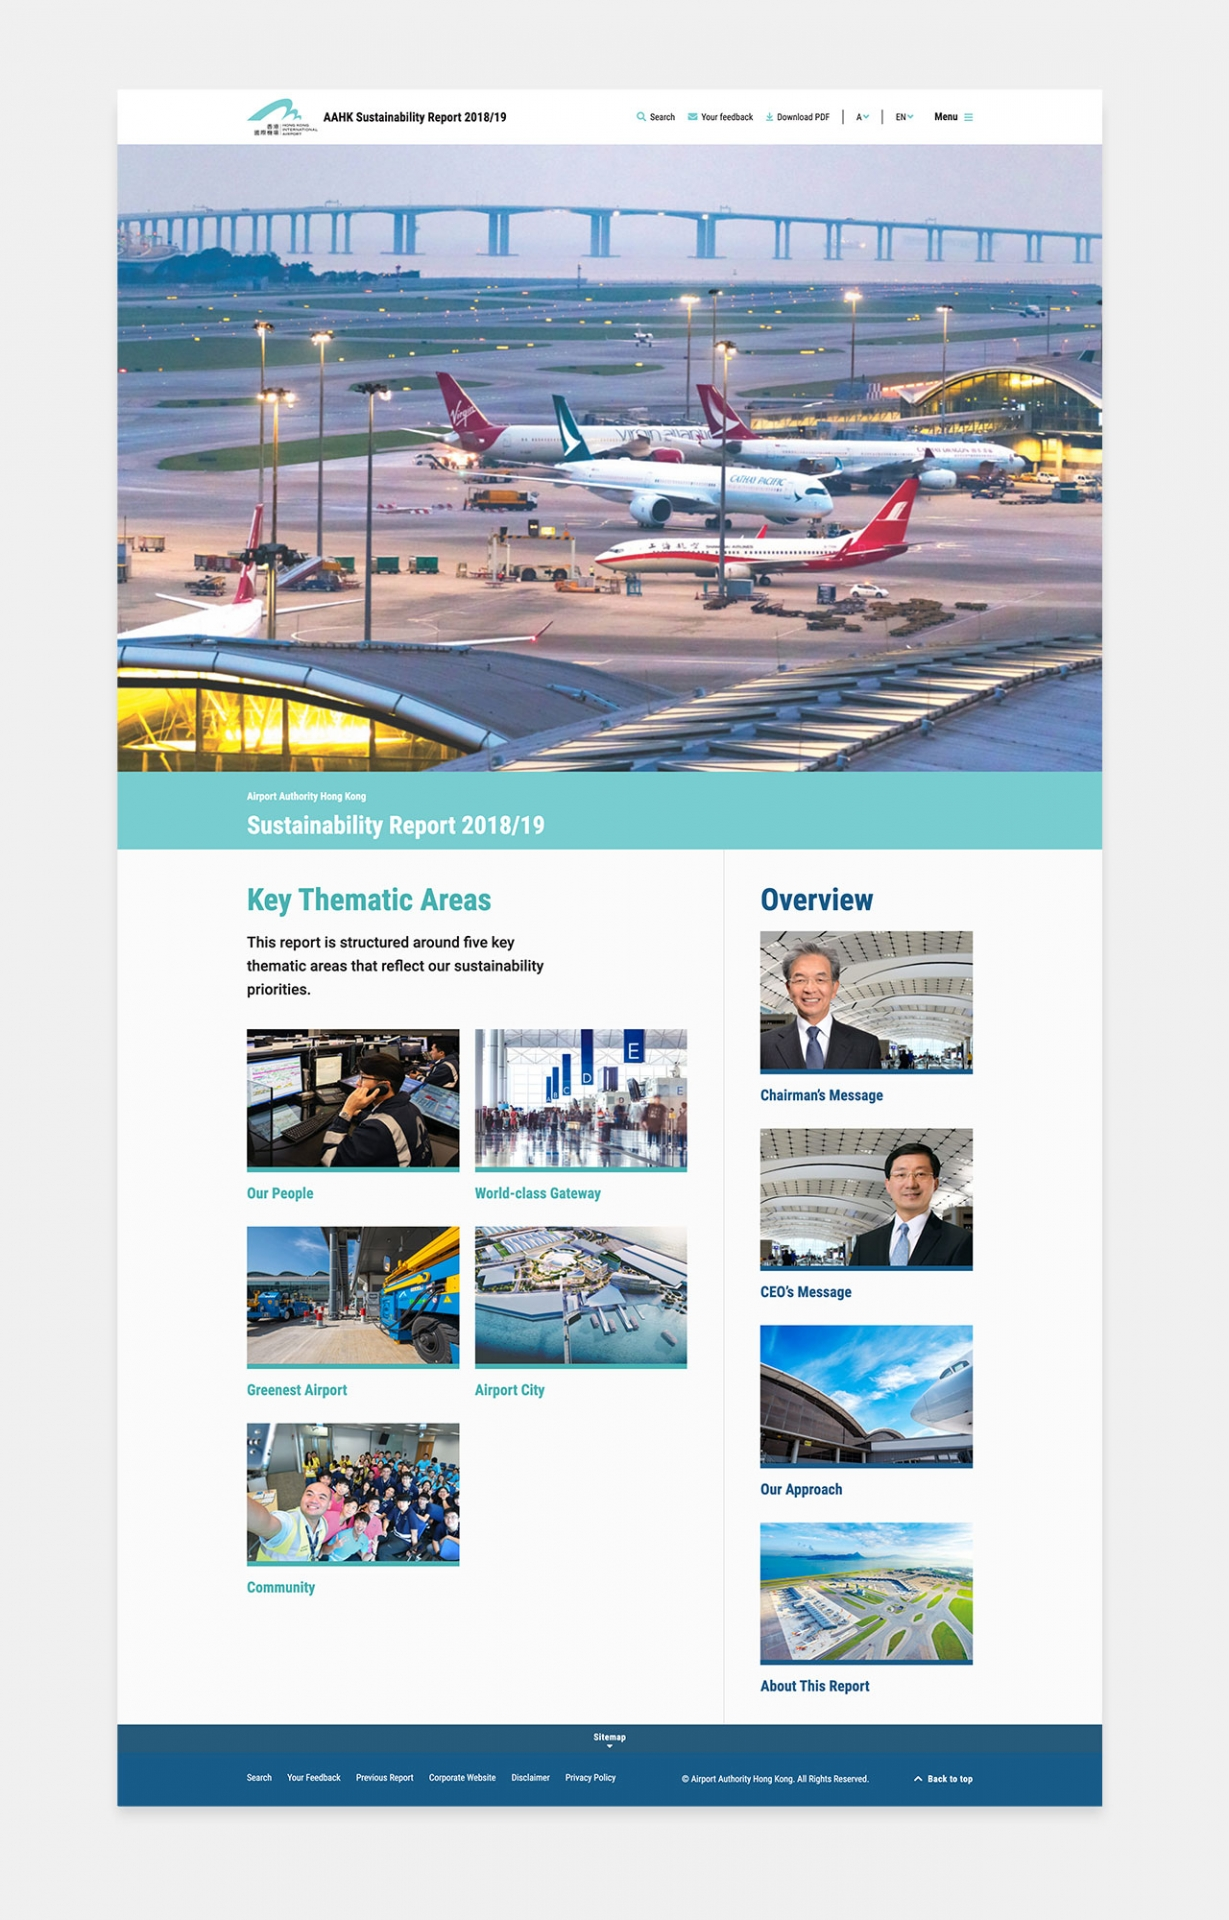 AAHK Sustainability Report 2018/19